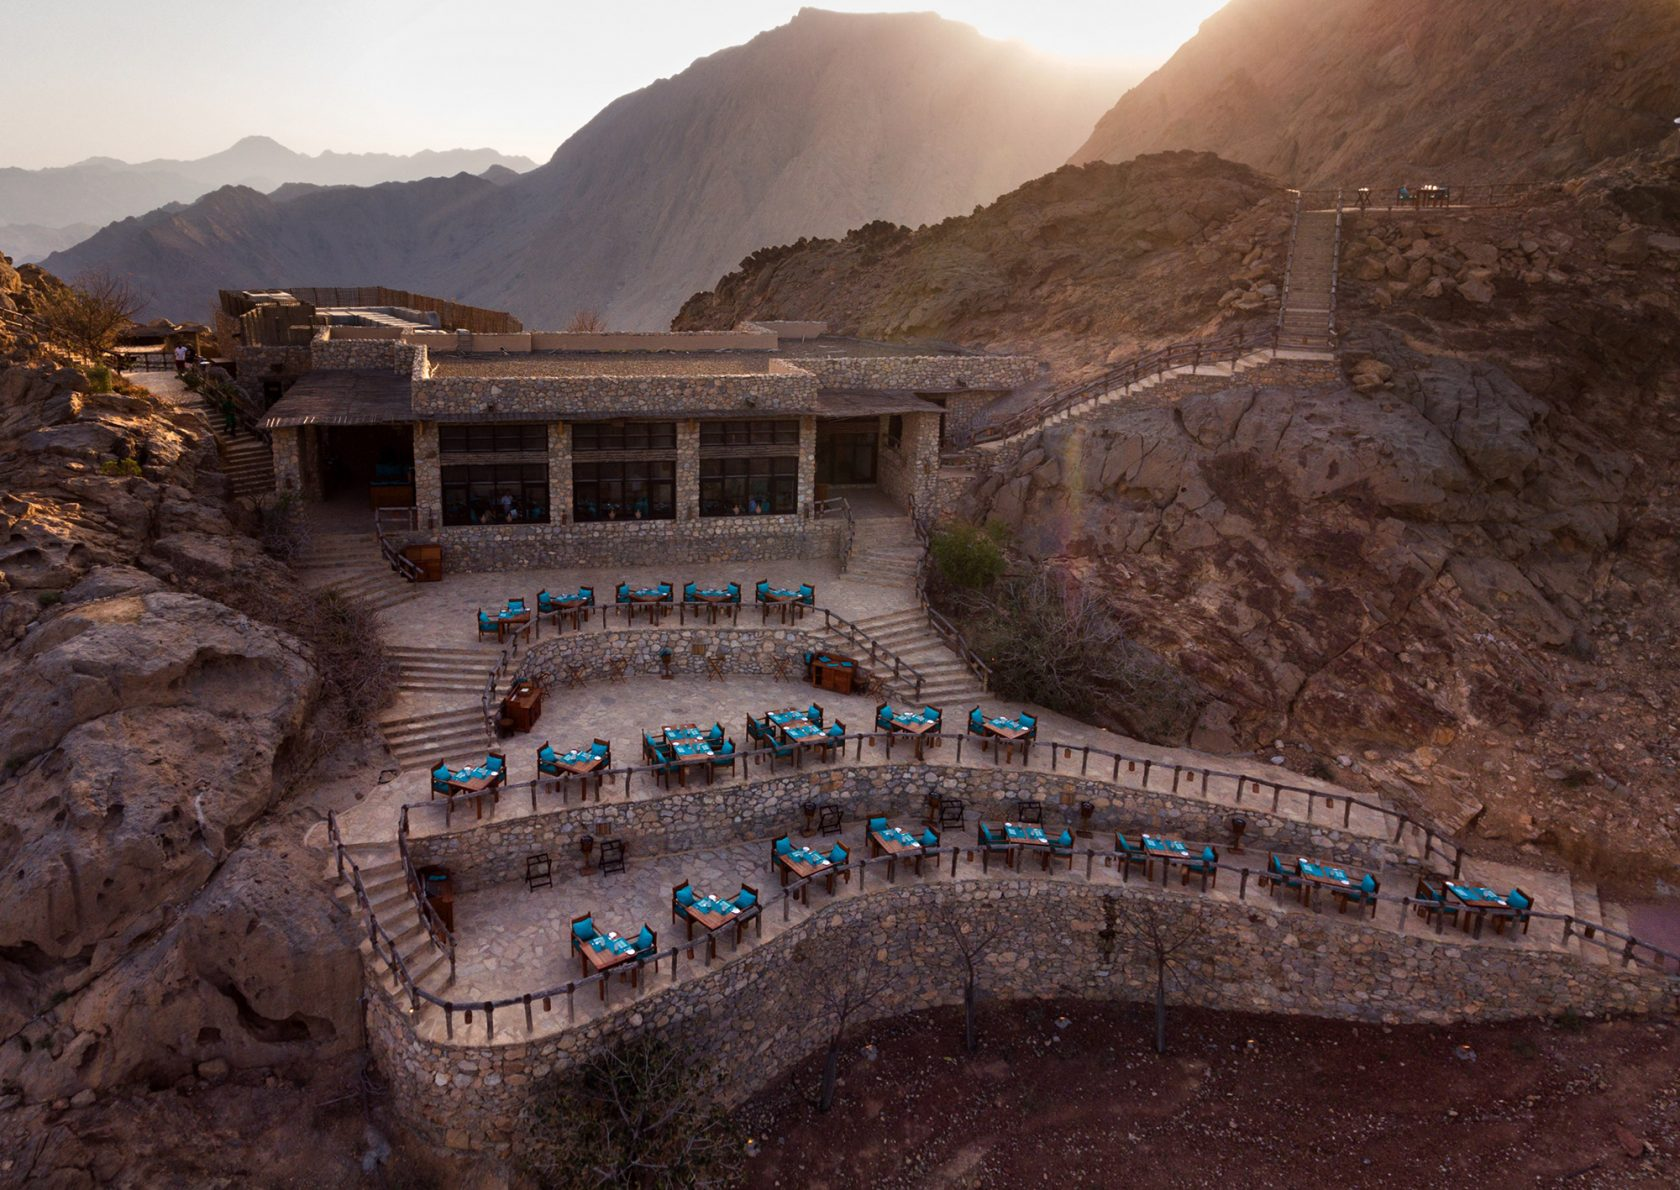 Six Senses Zighy Bay, Oman – Sense on the Edge